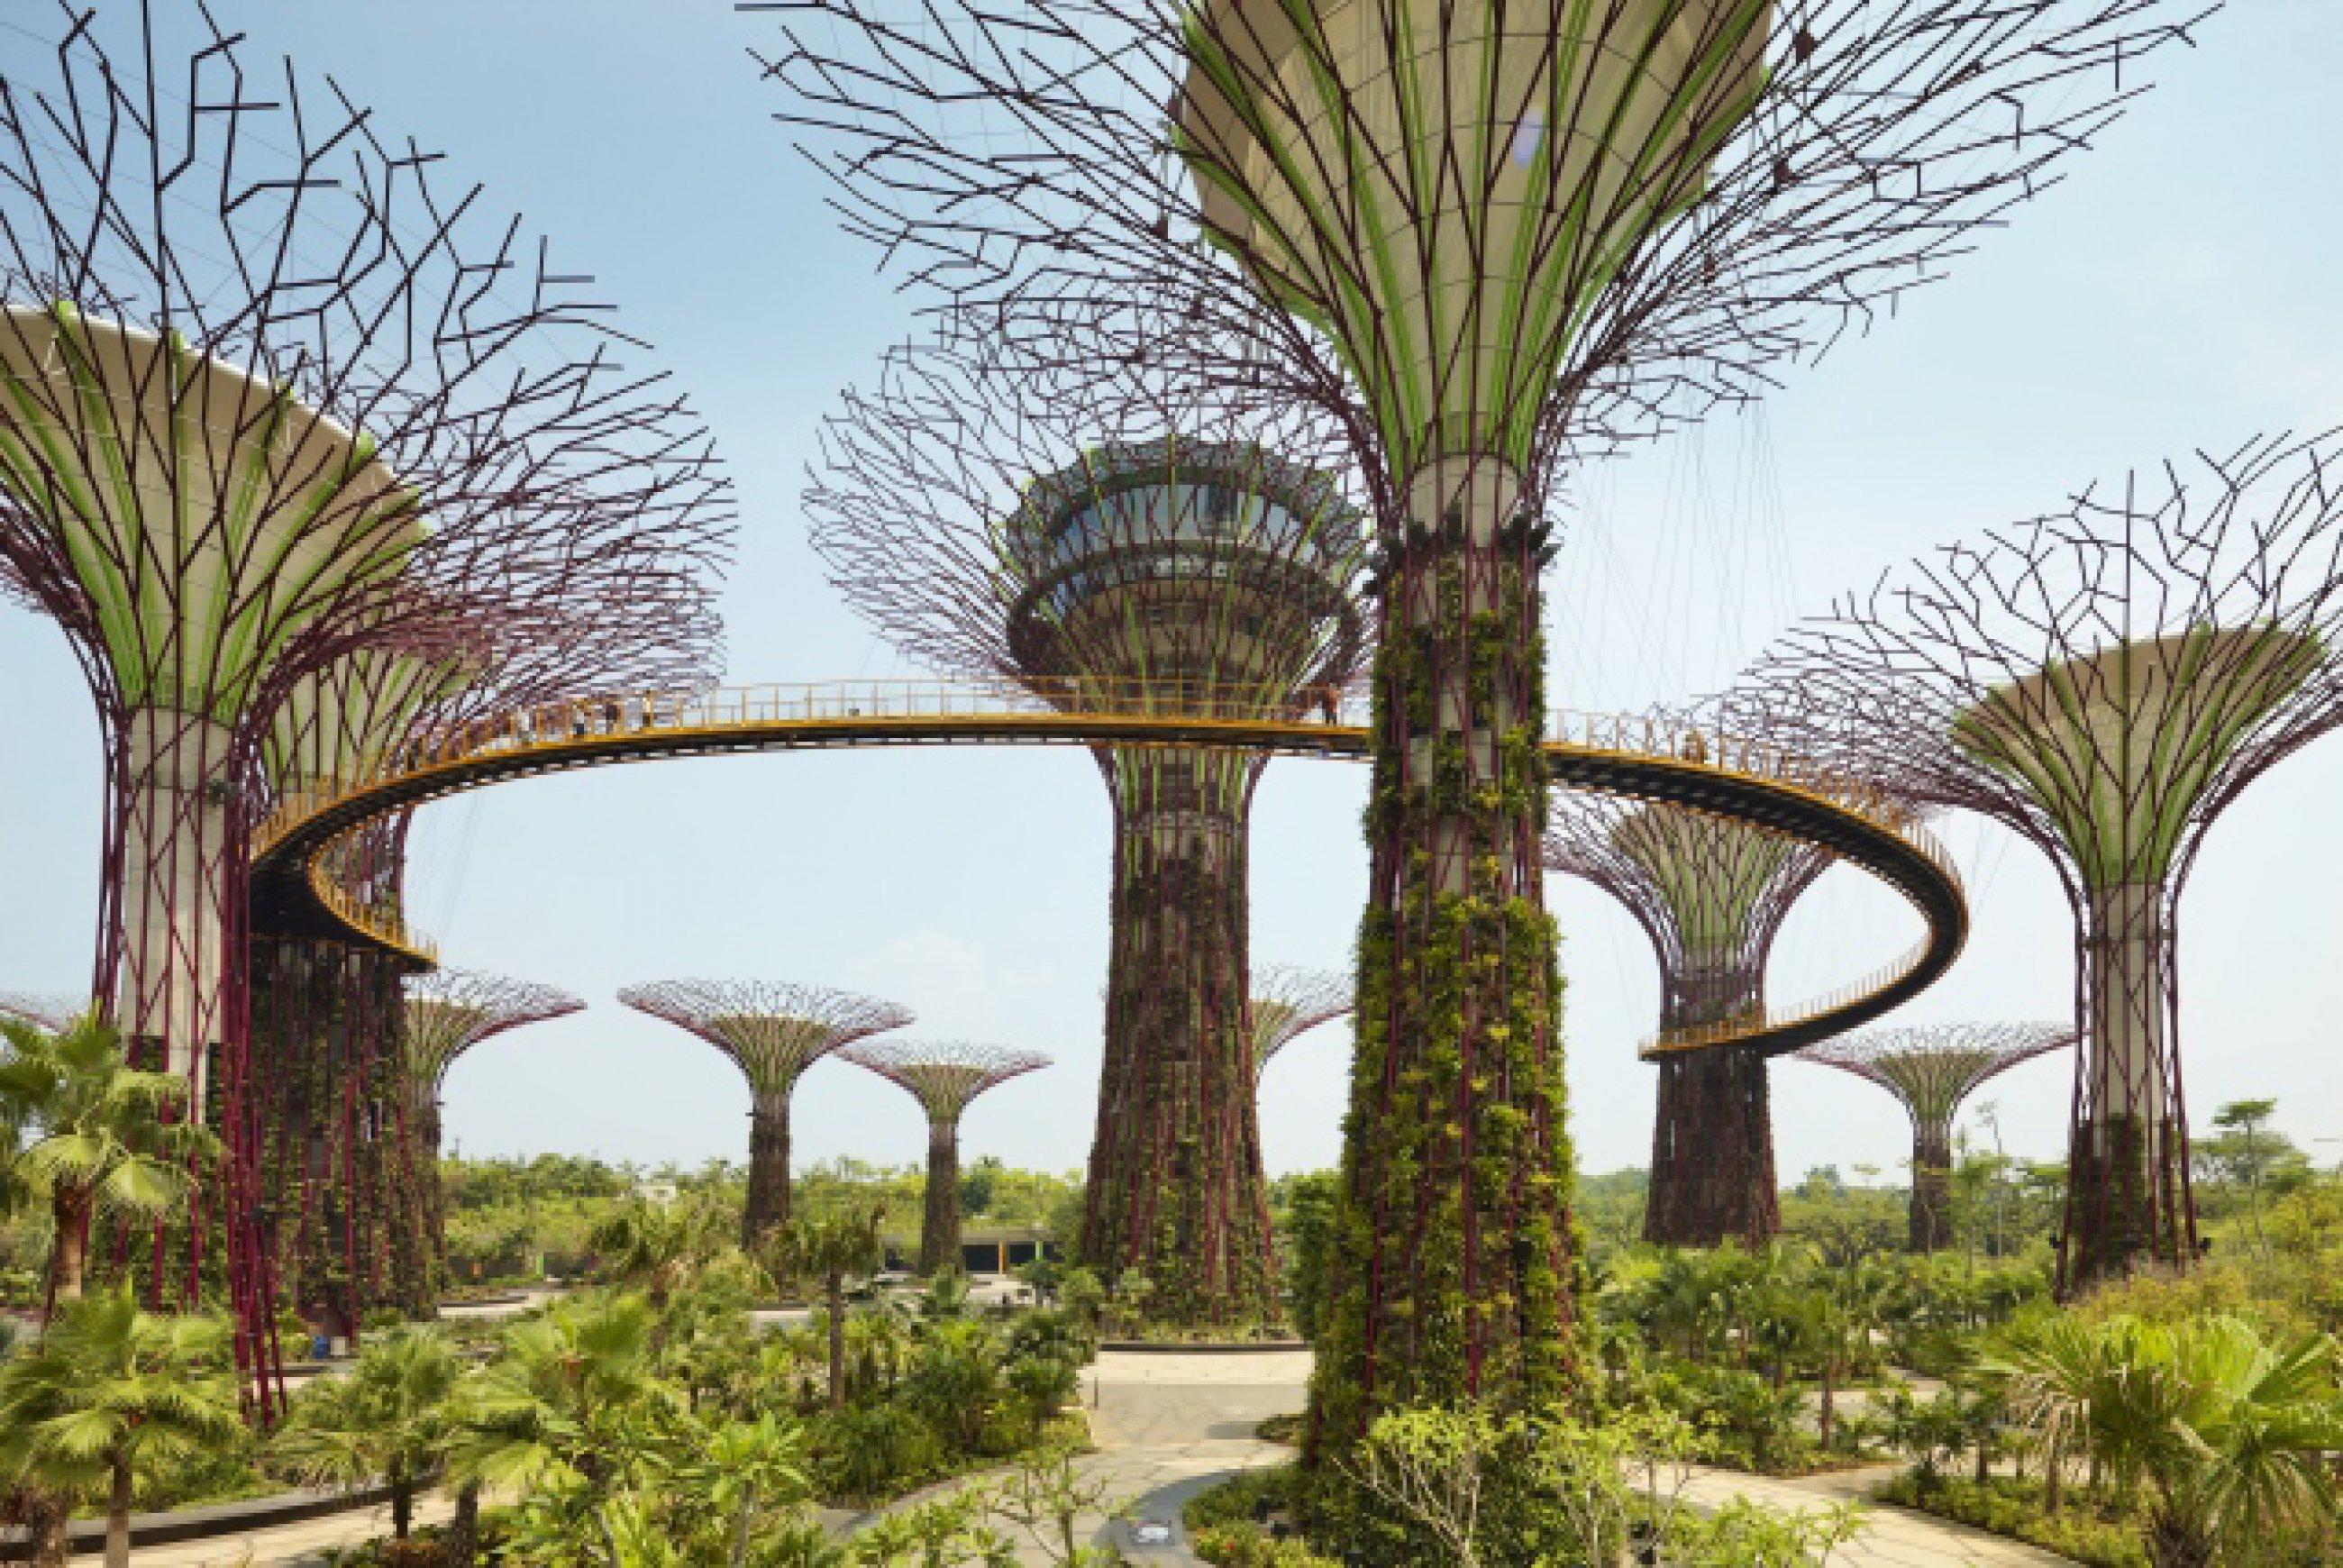 https://bubo.sk/uploads/galleries/8377/gardens-by-the-bay-singapore.jpg